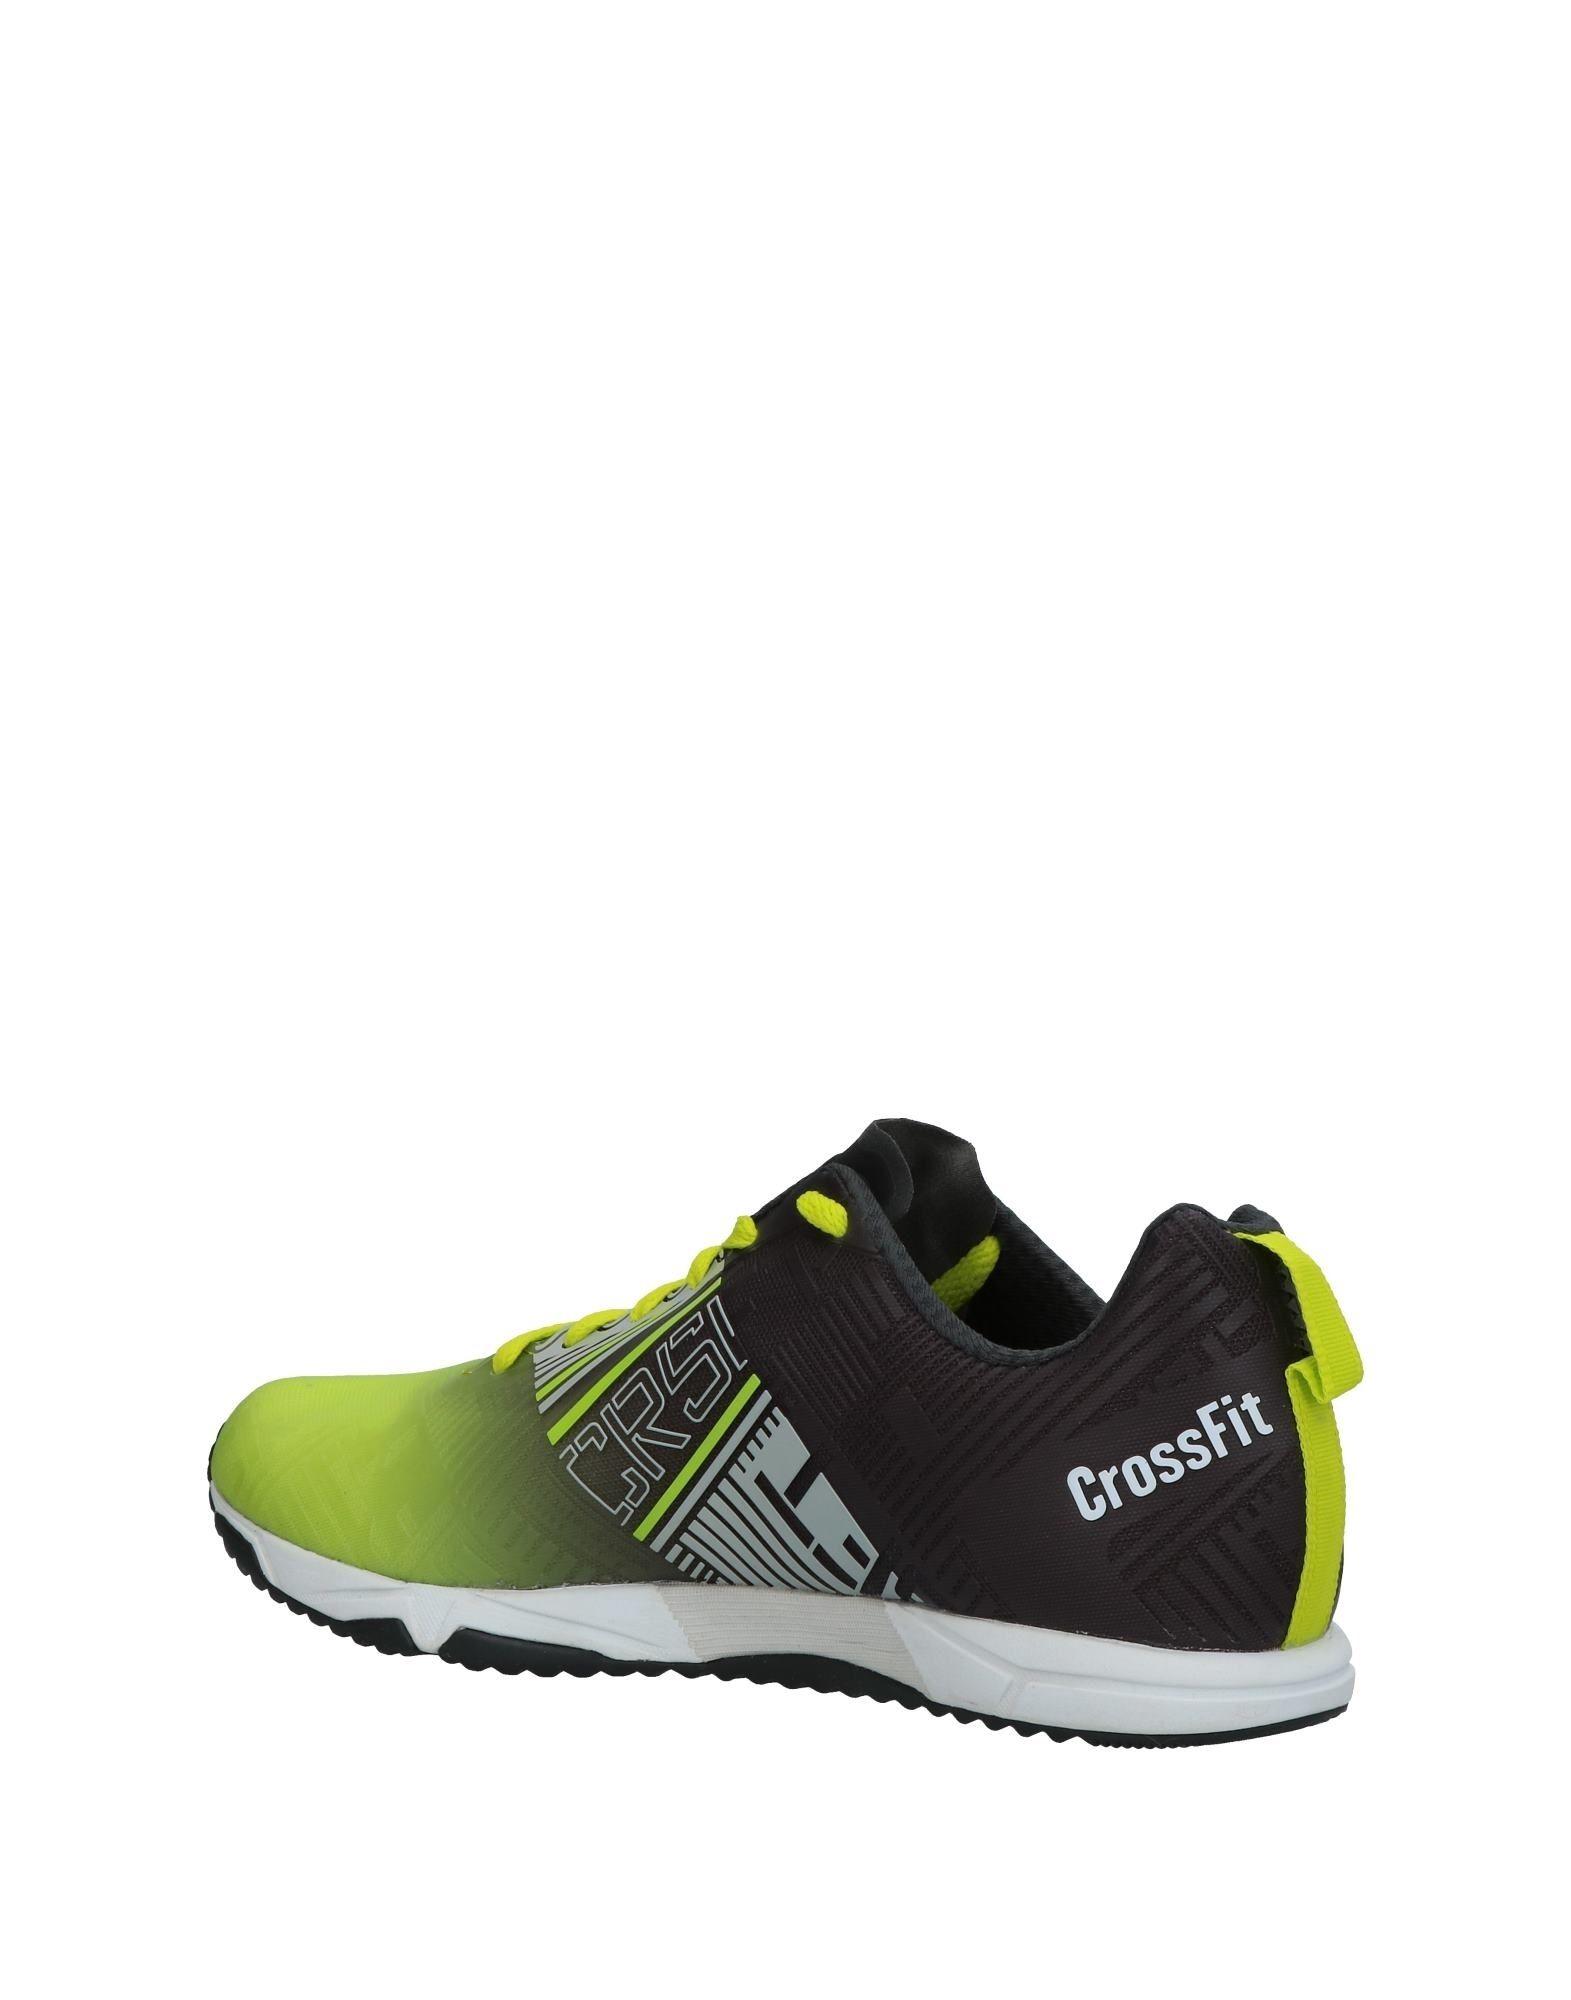 Rabatt echte Schuhe Herren Reebok Sneakers Herren Schuhe  11407558SA d5dac4